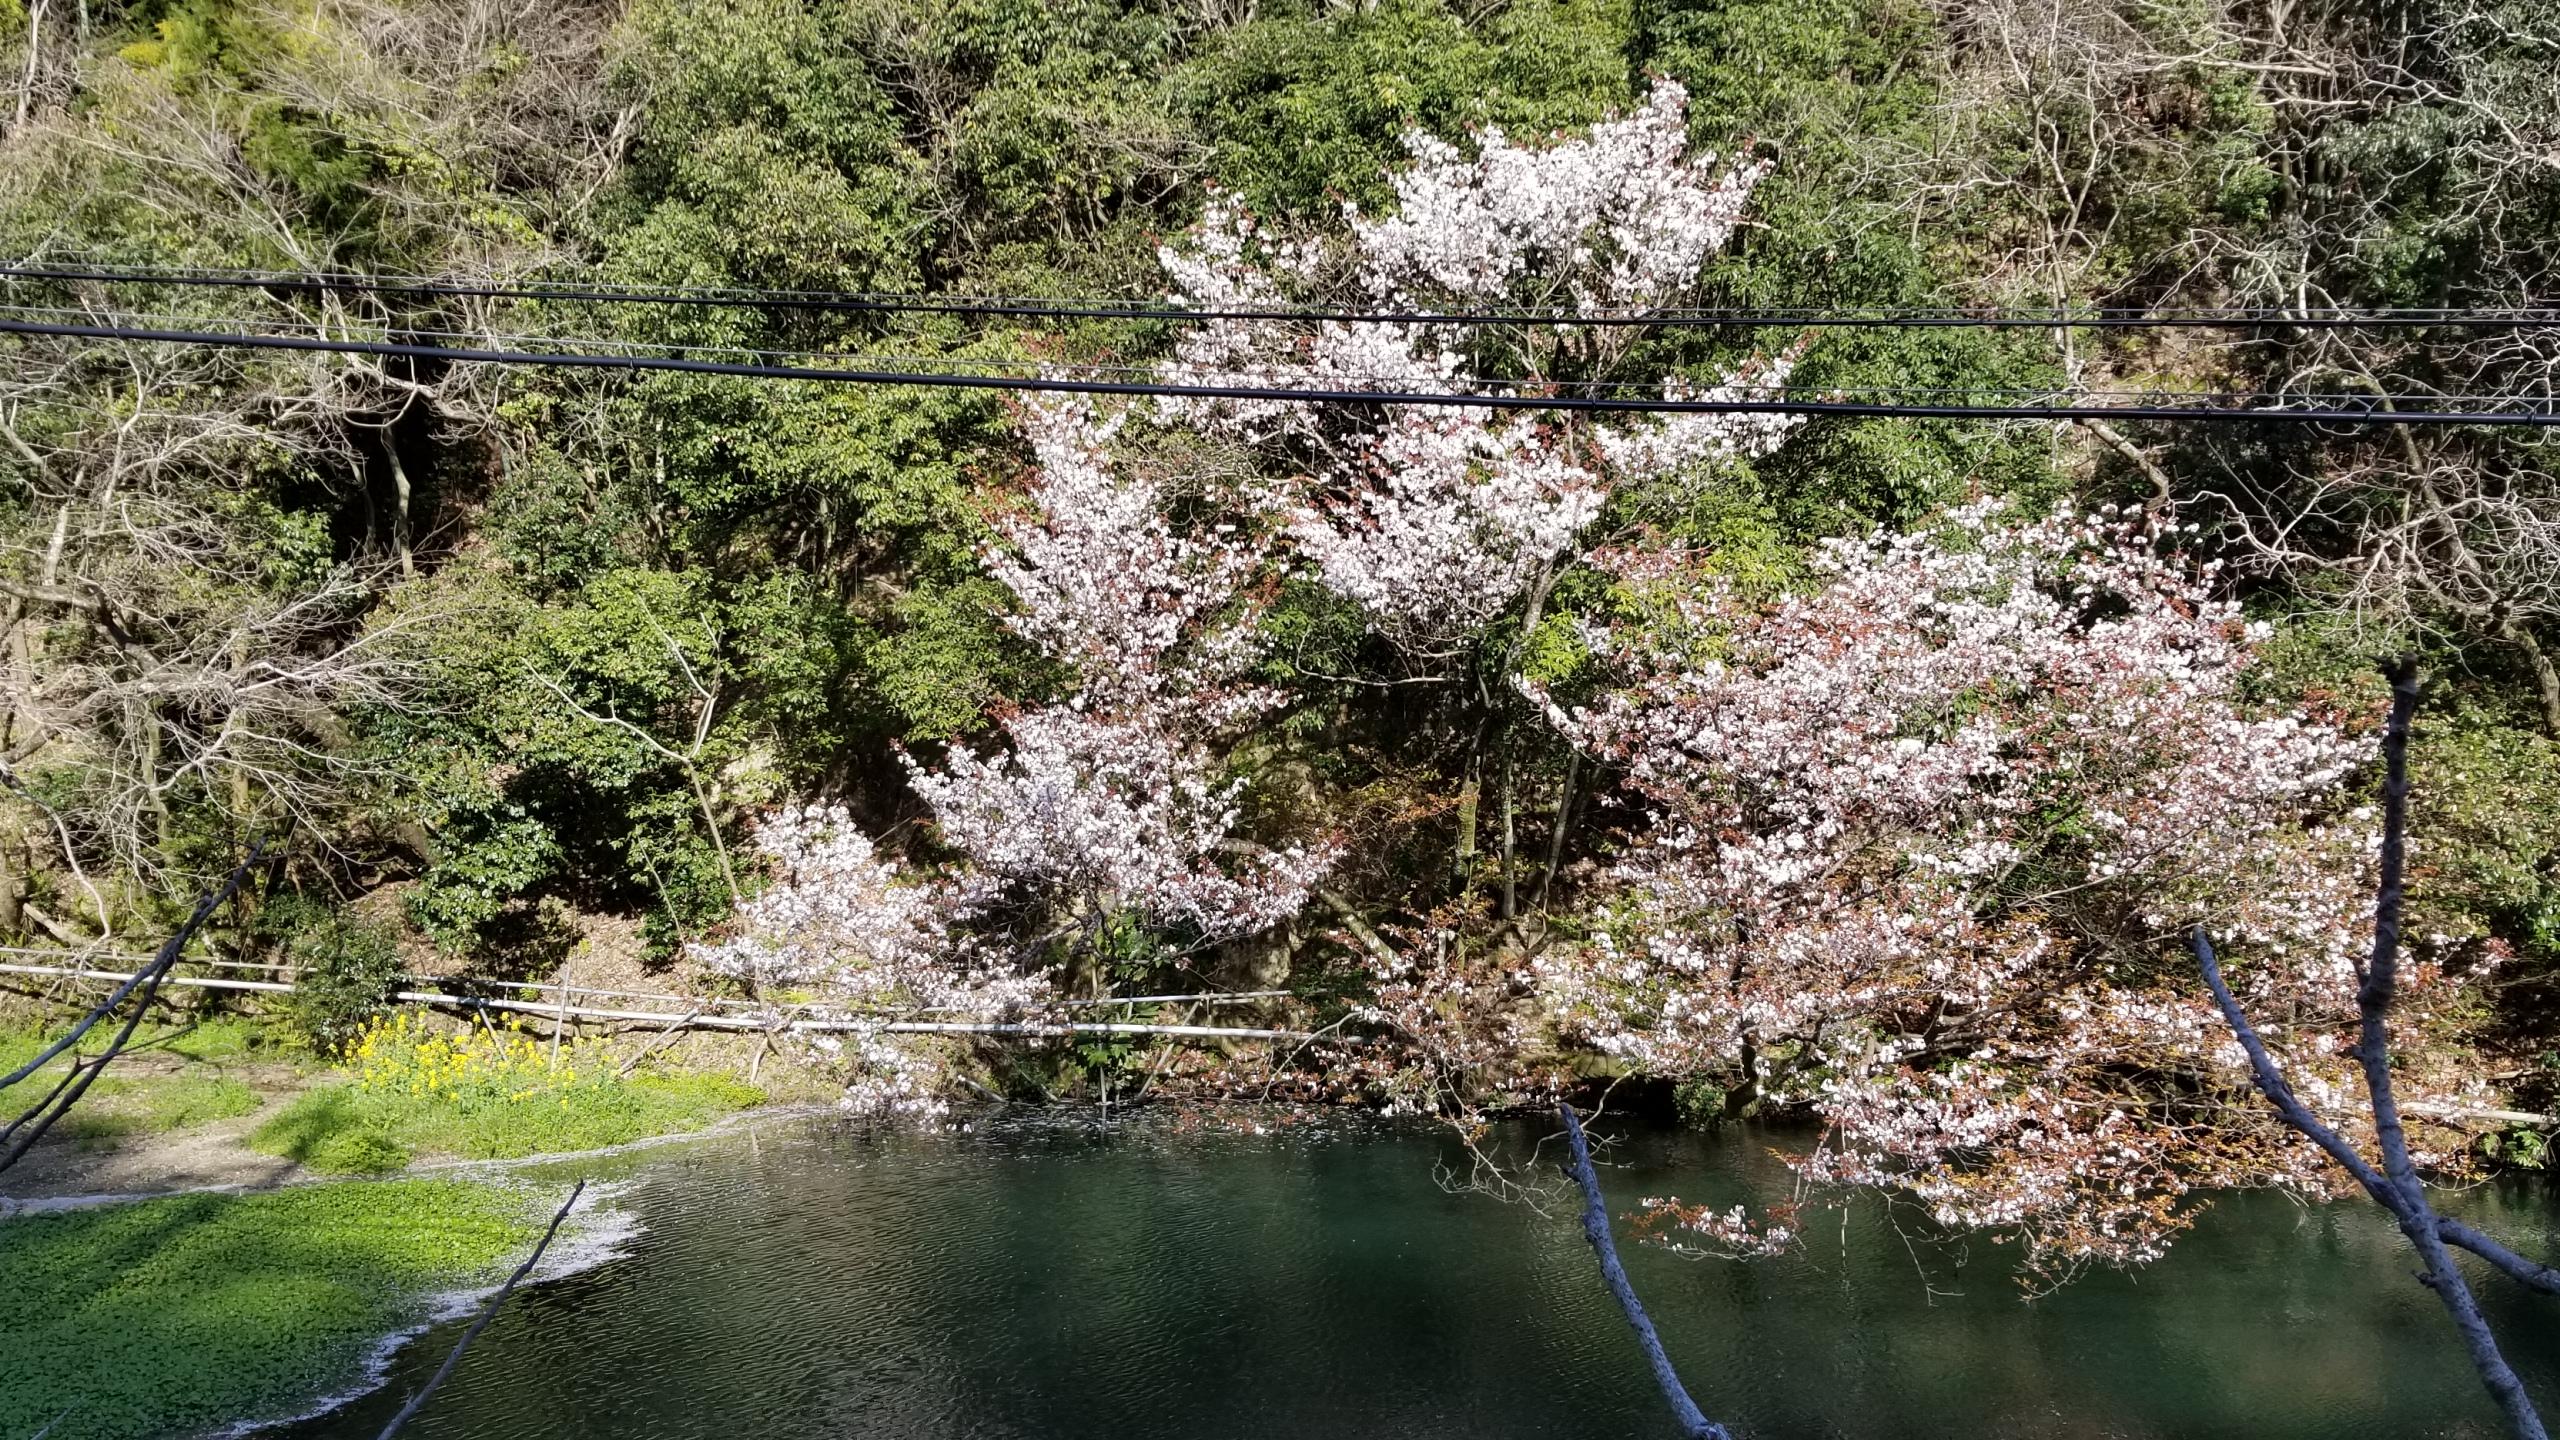 桜開花時期咲く満開ソメイヨシノ愛媛県絶景見頃3月下旬見る会